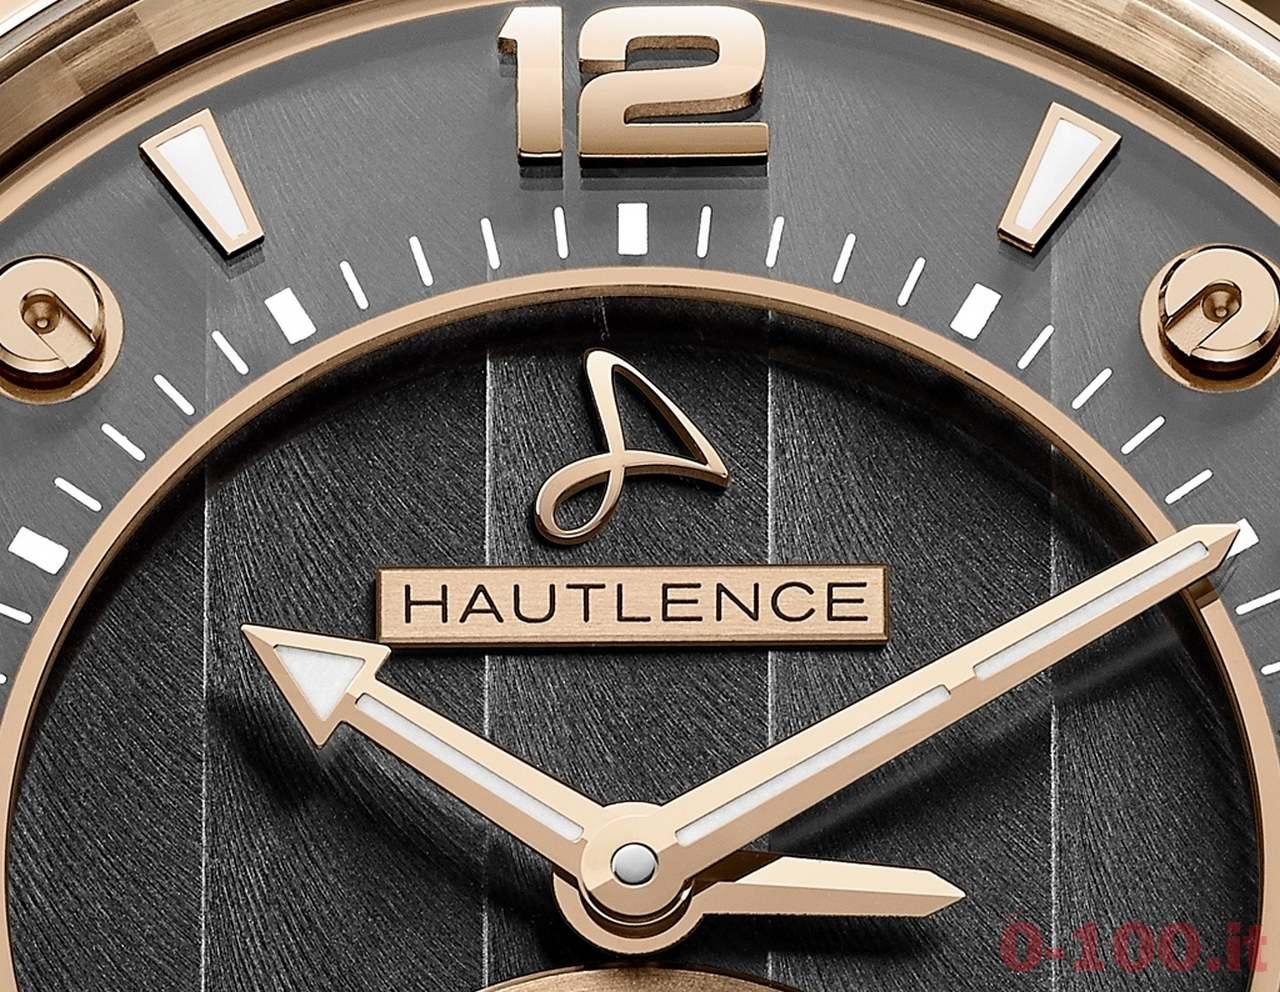 hautlence-tourbillon-01-prezzo-price_0-1002